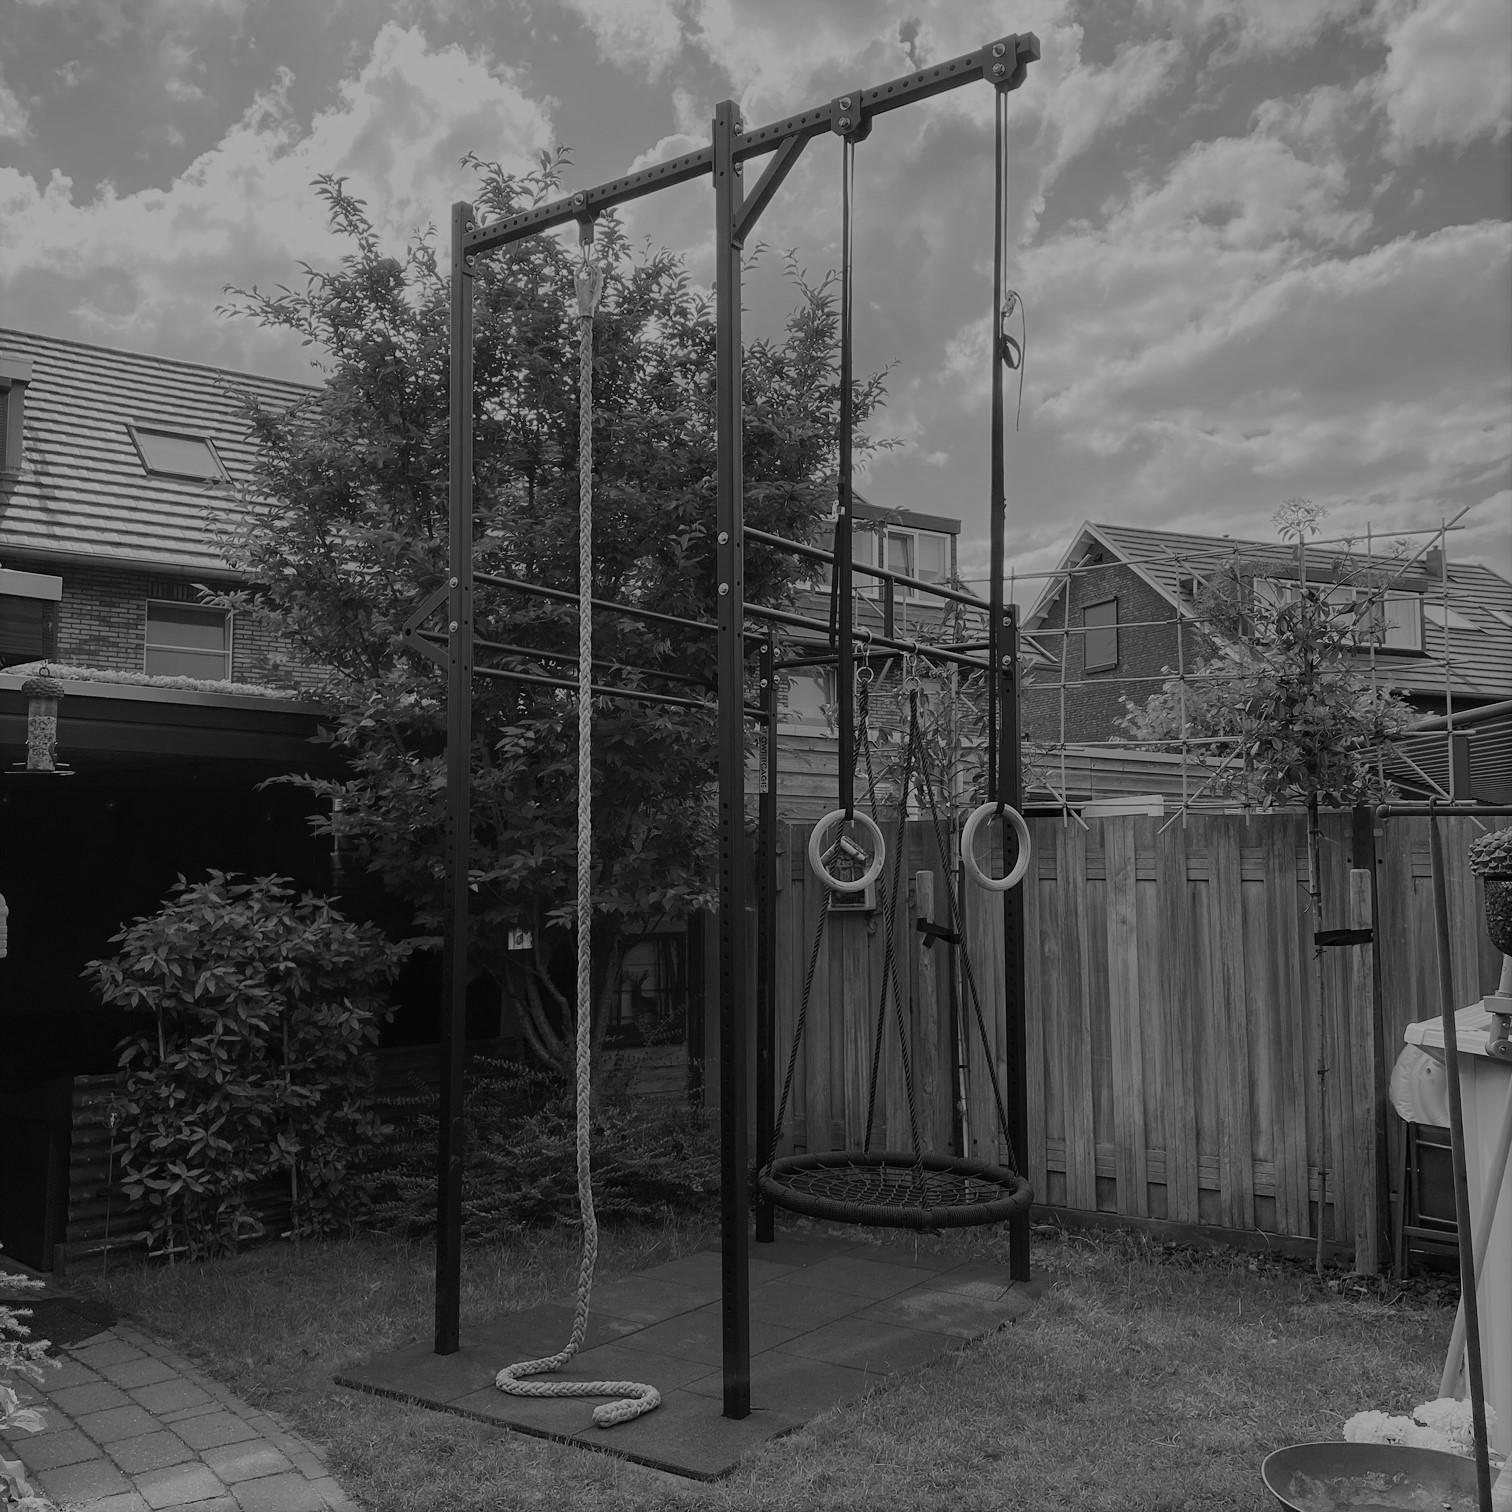 Outdoor R5-4